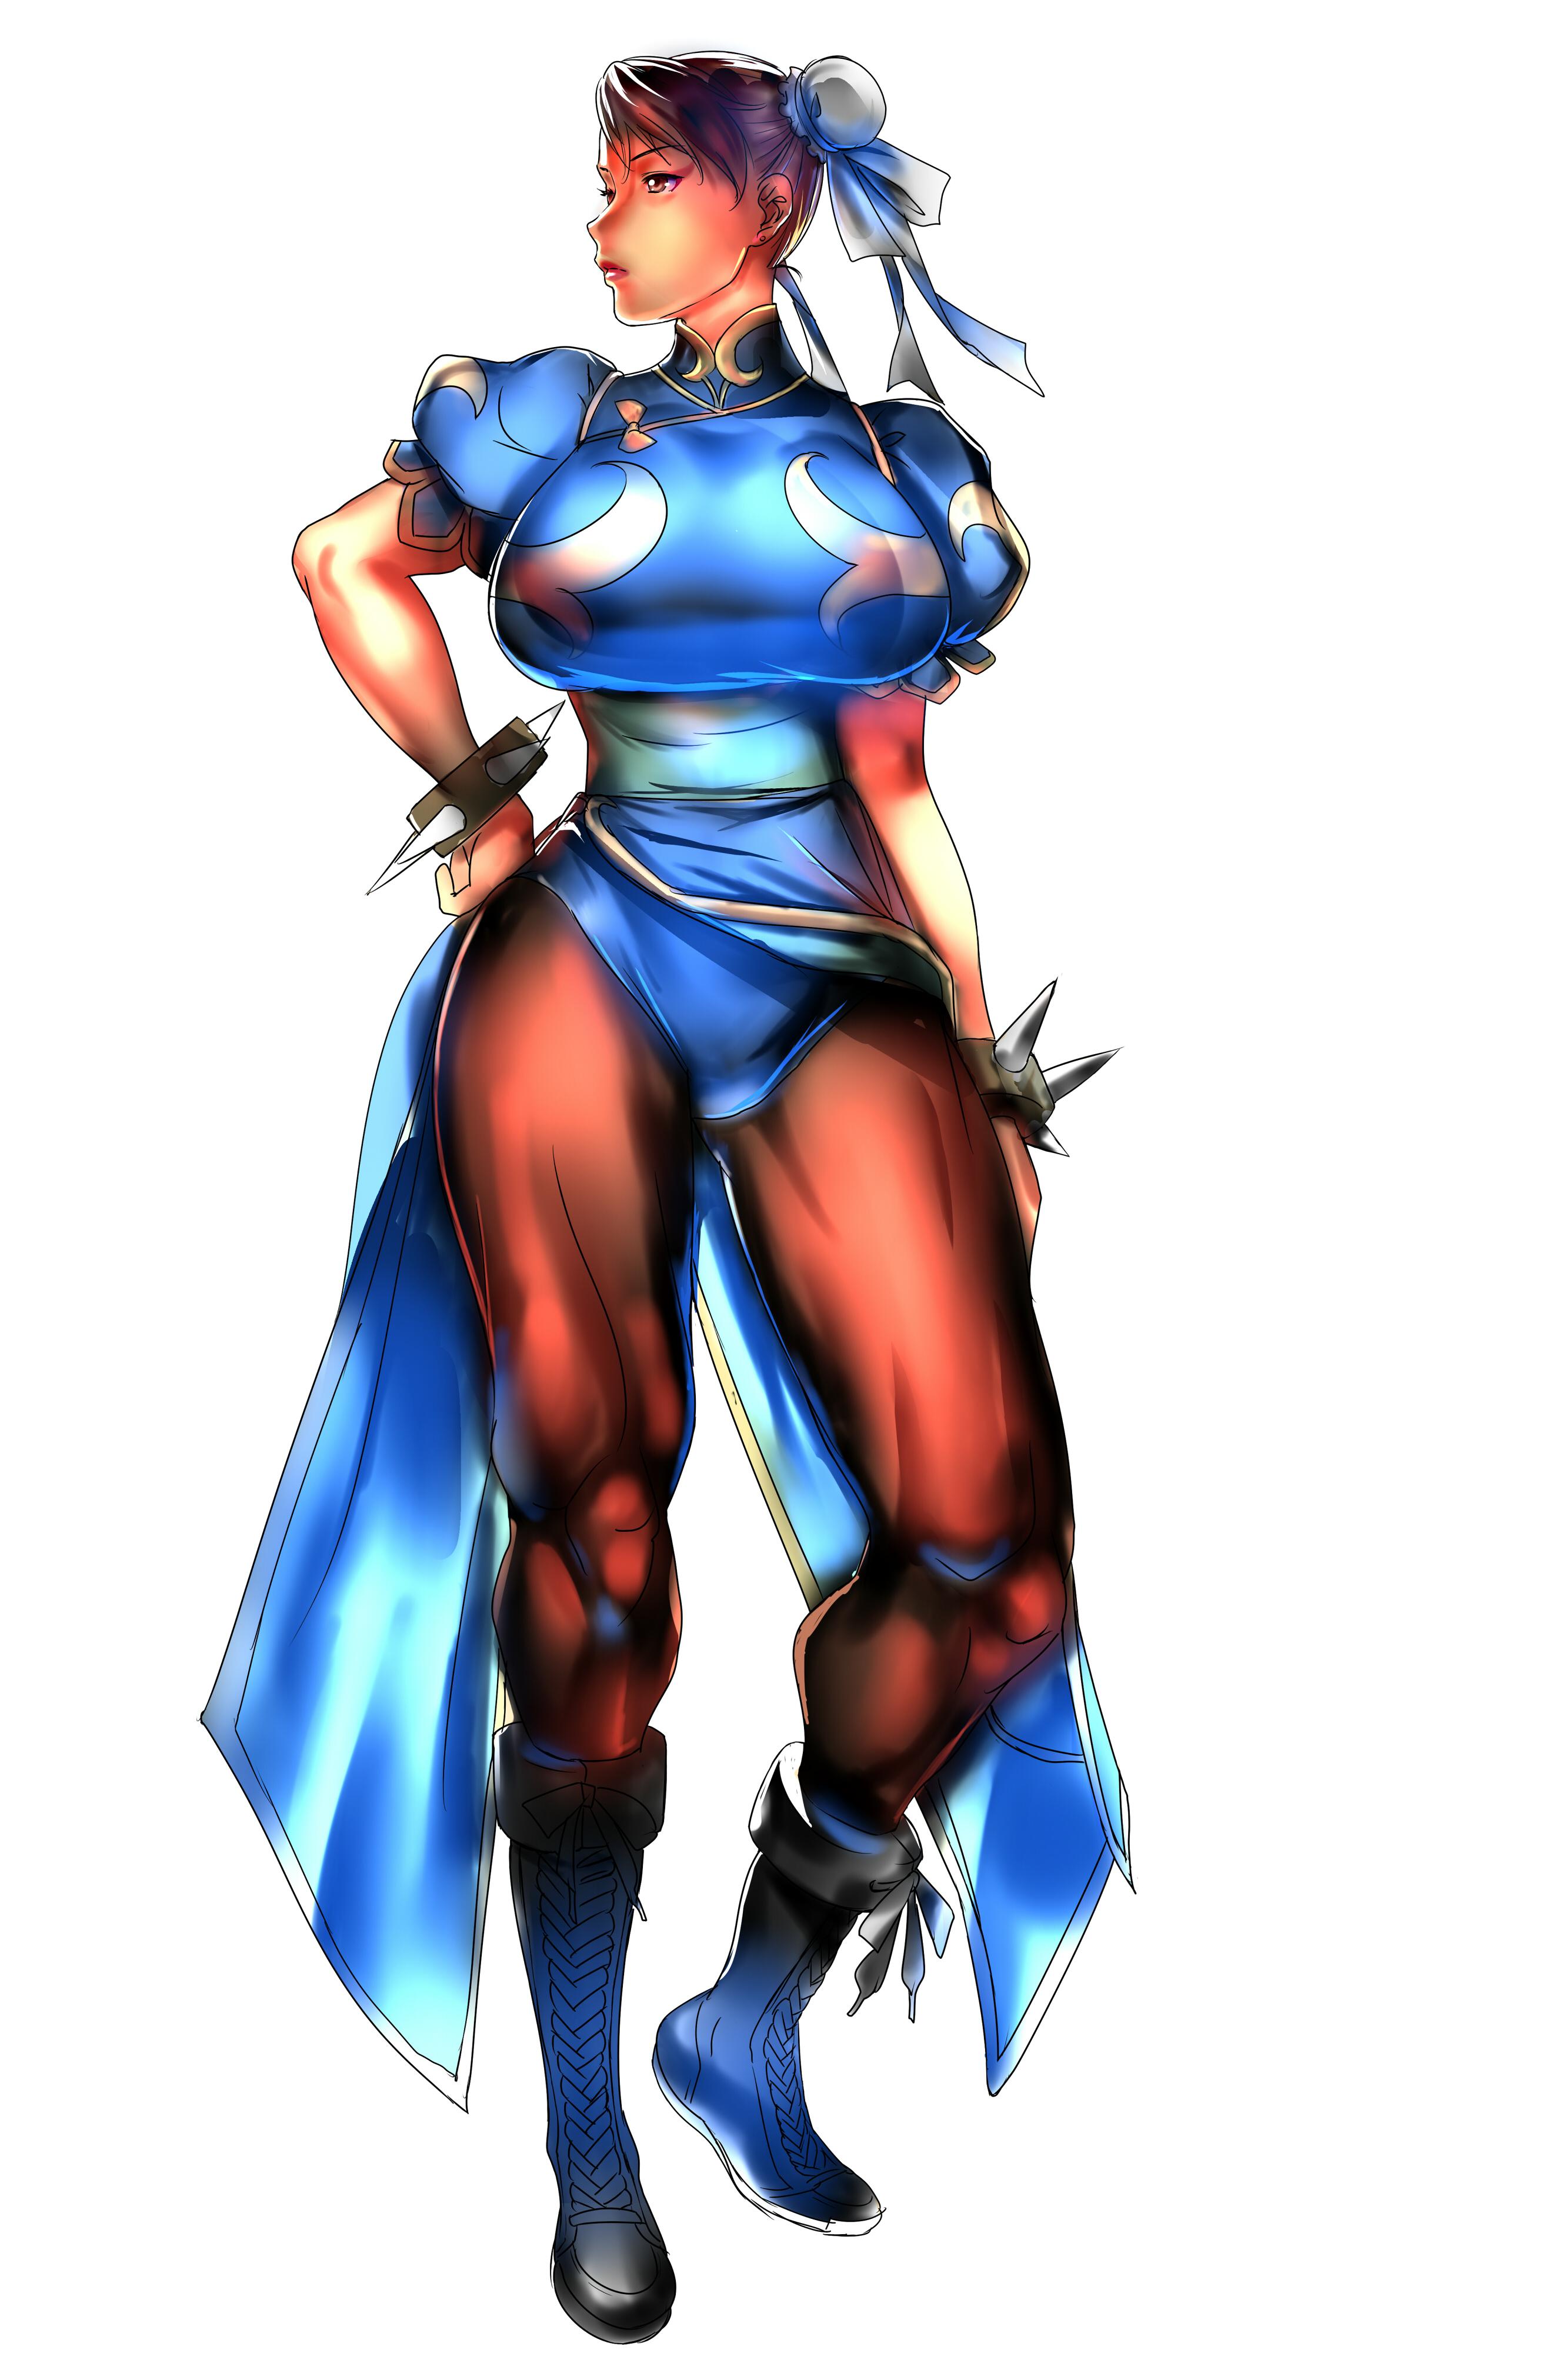 Chun-li - Street Fighter - Image  2861819